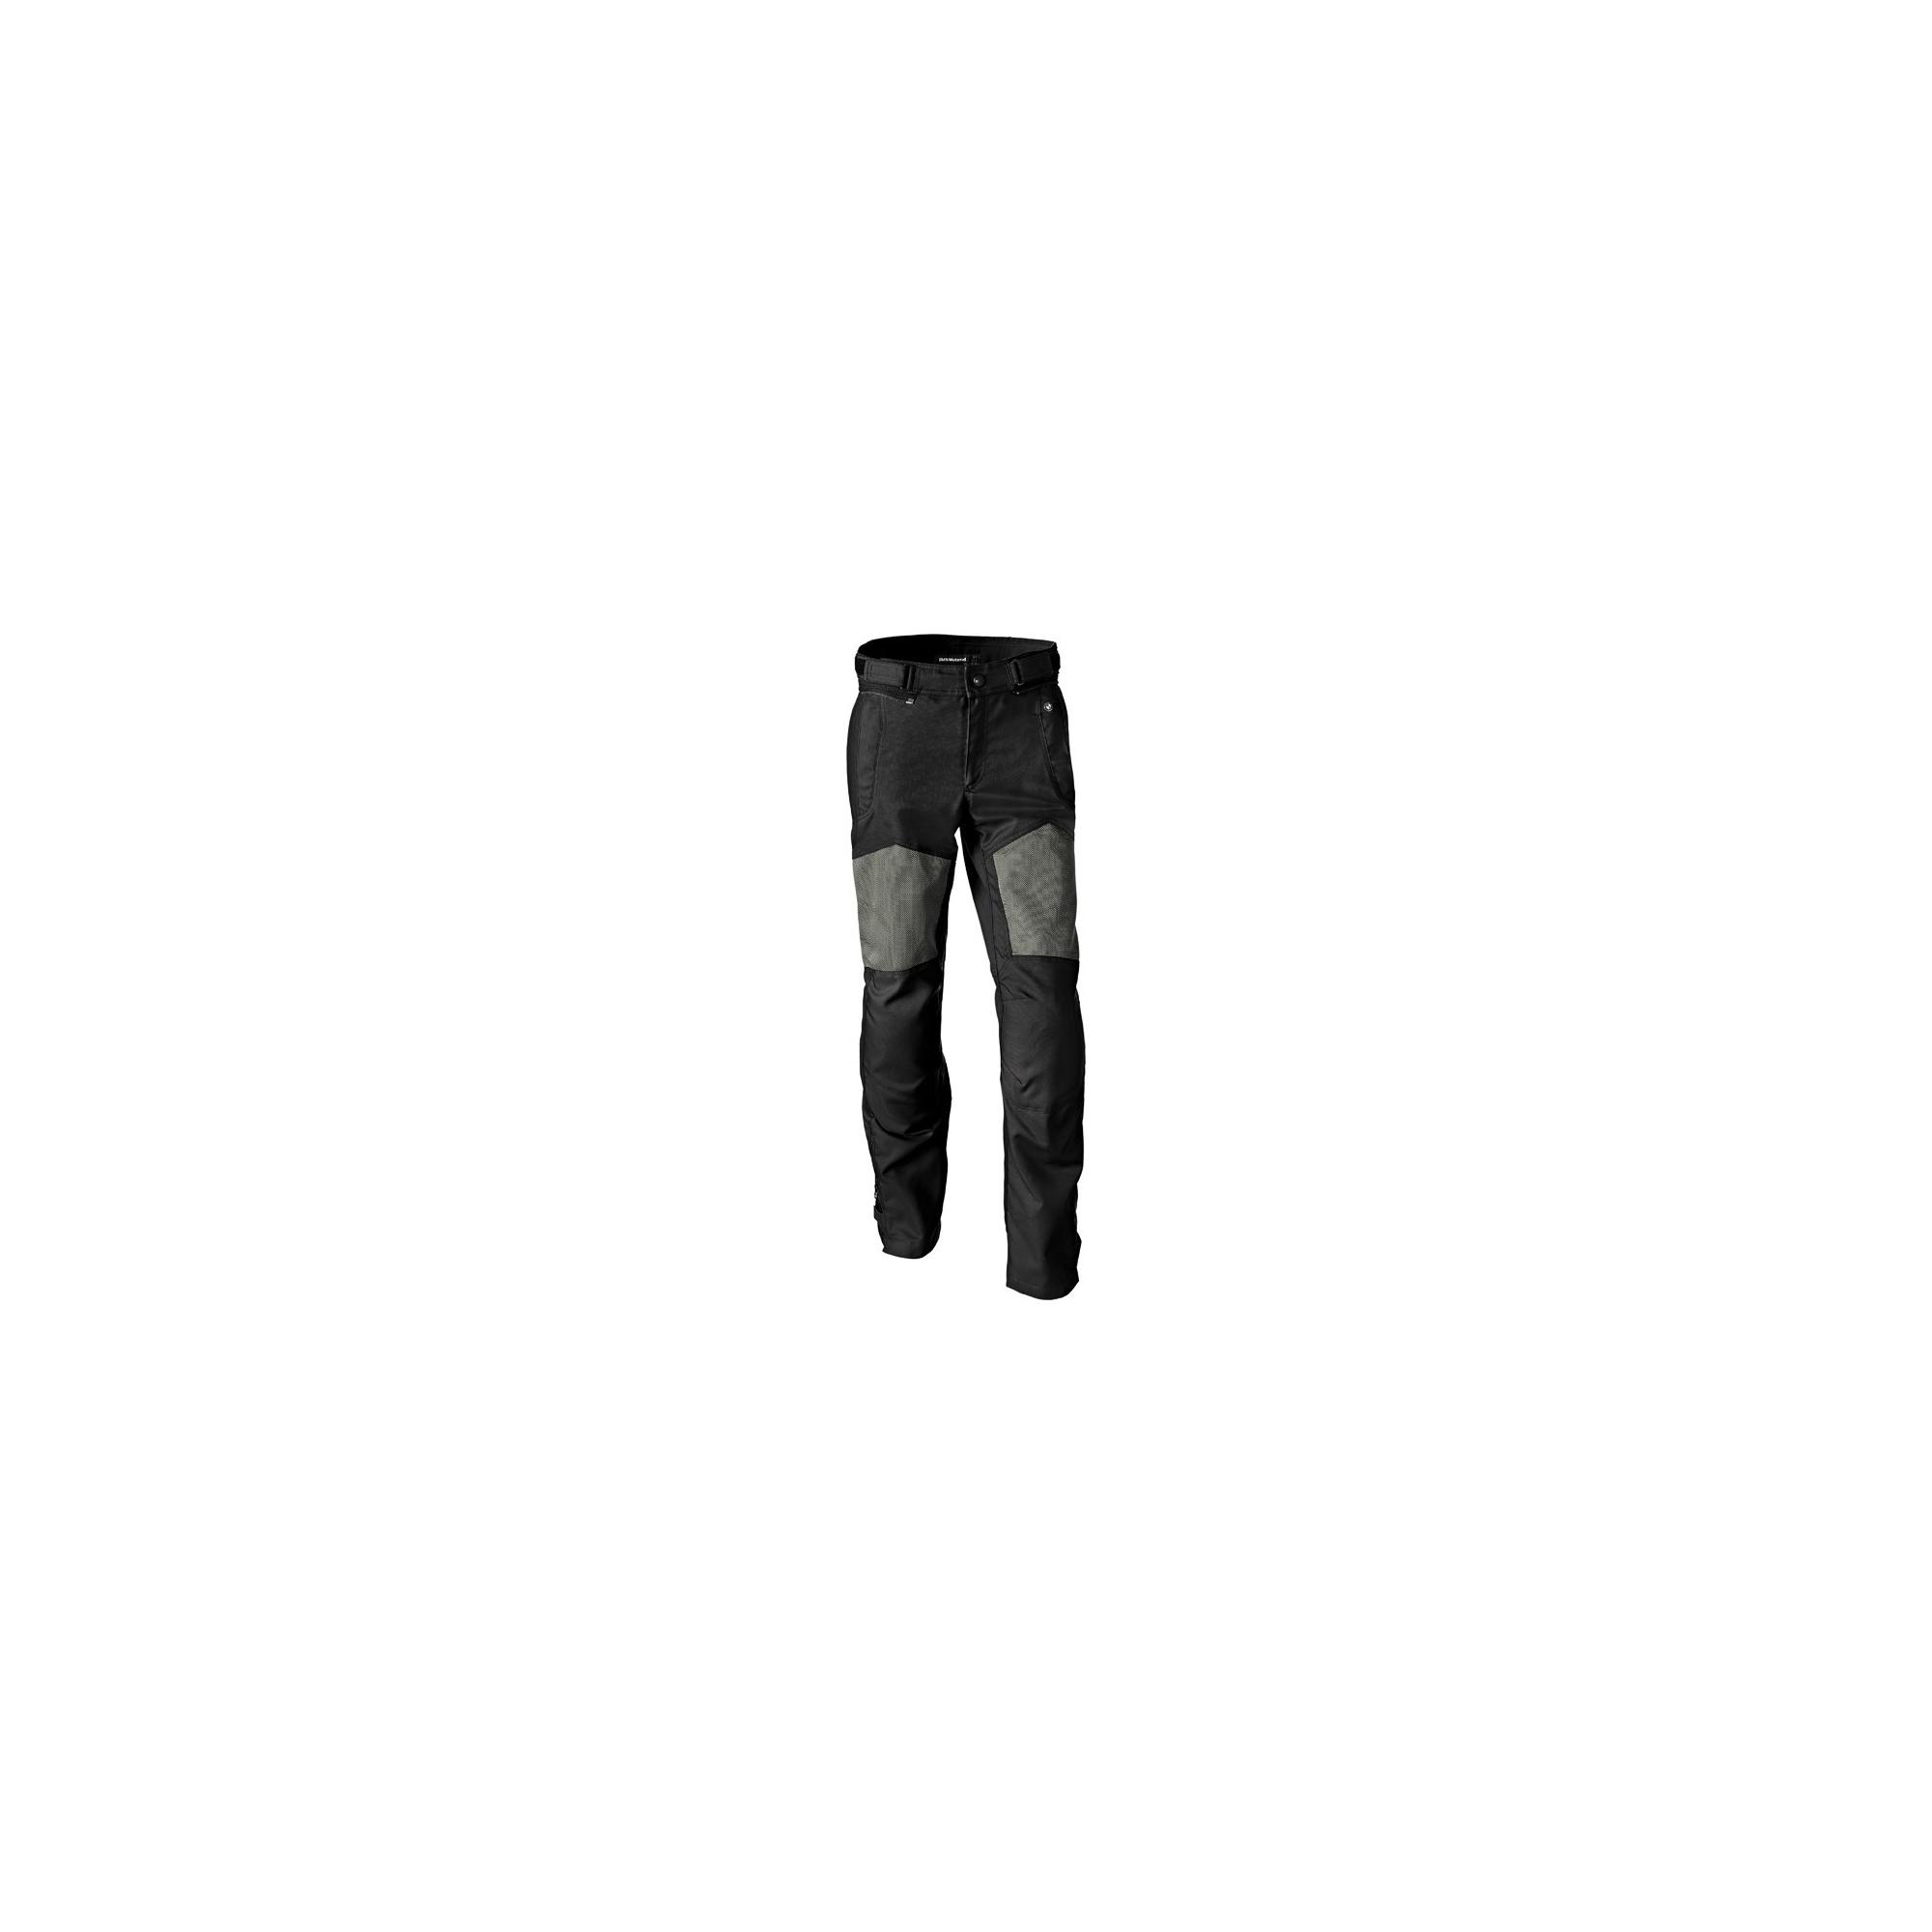 Pantalón de moto AIRFLOW SUIT Negro para hombre